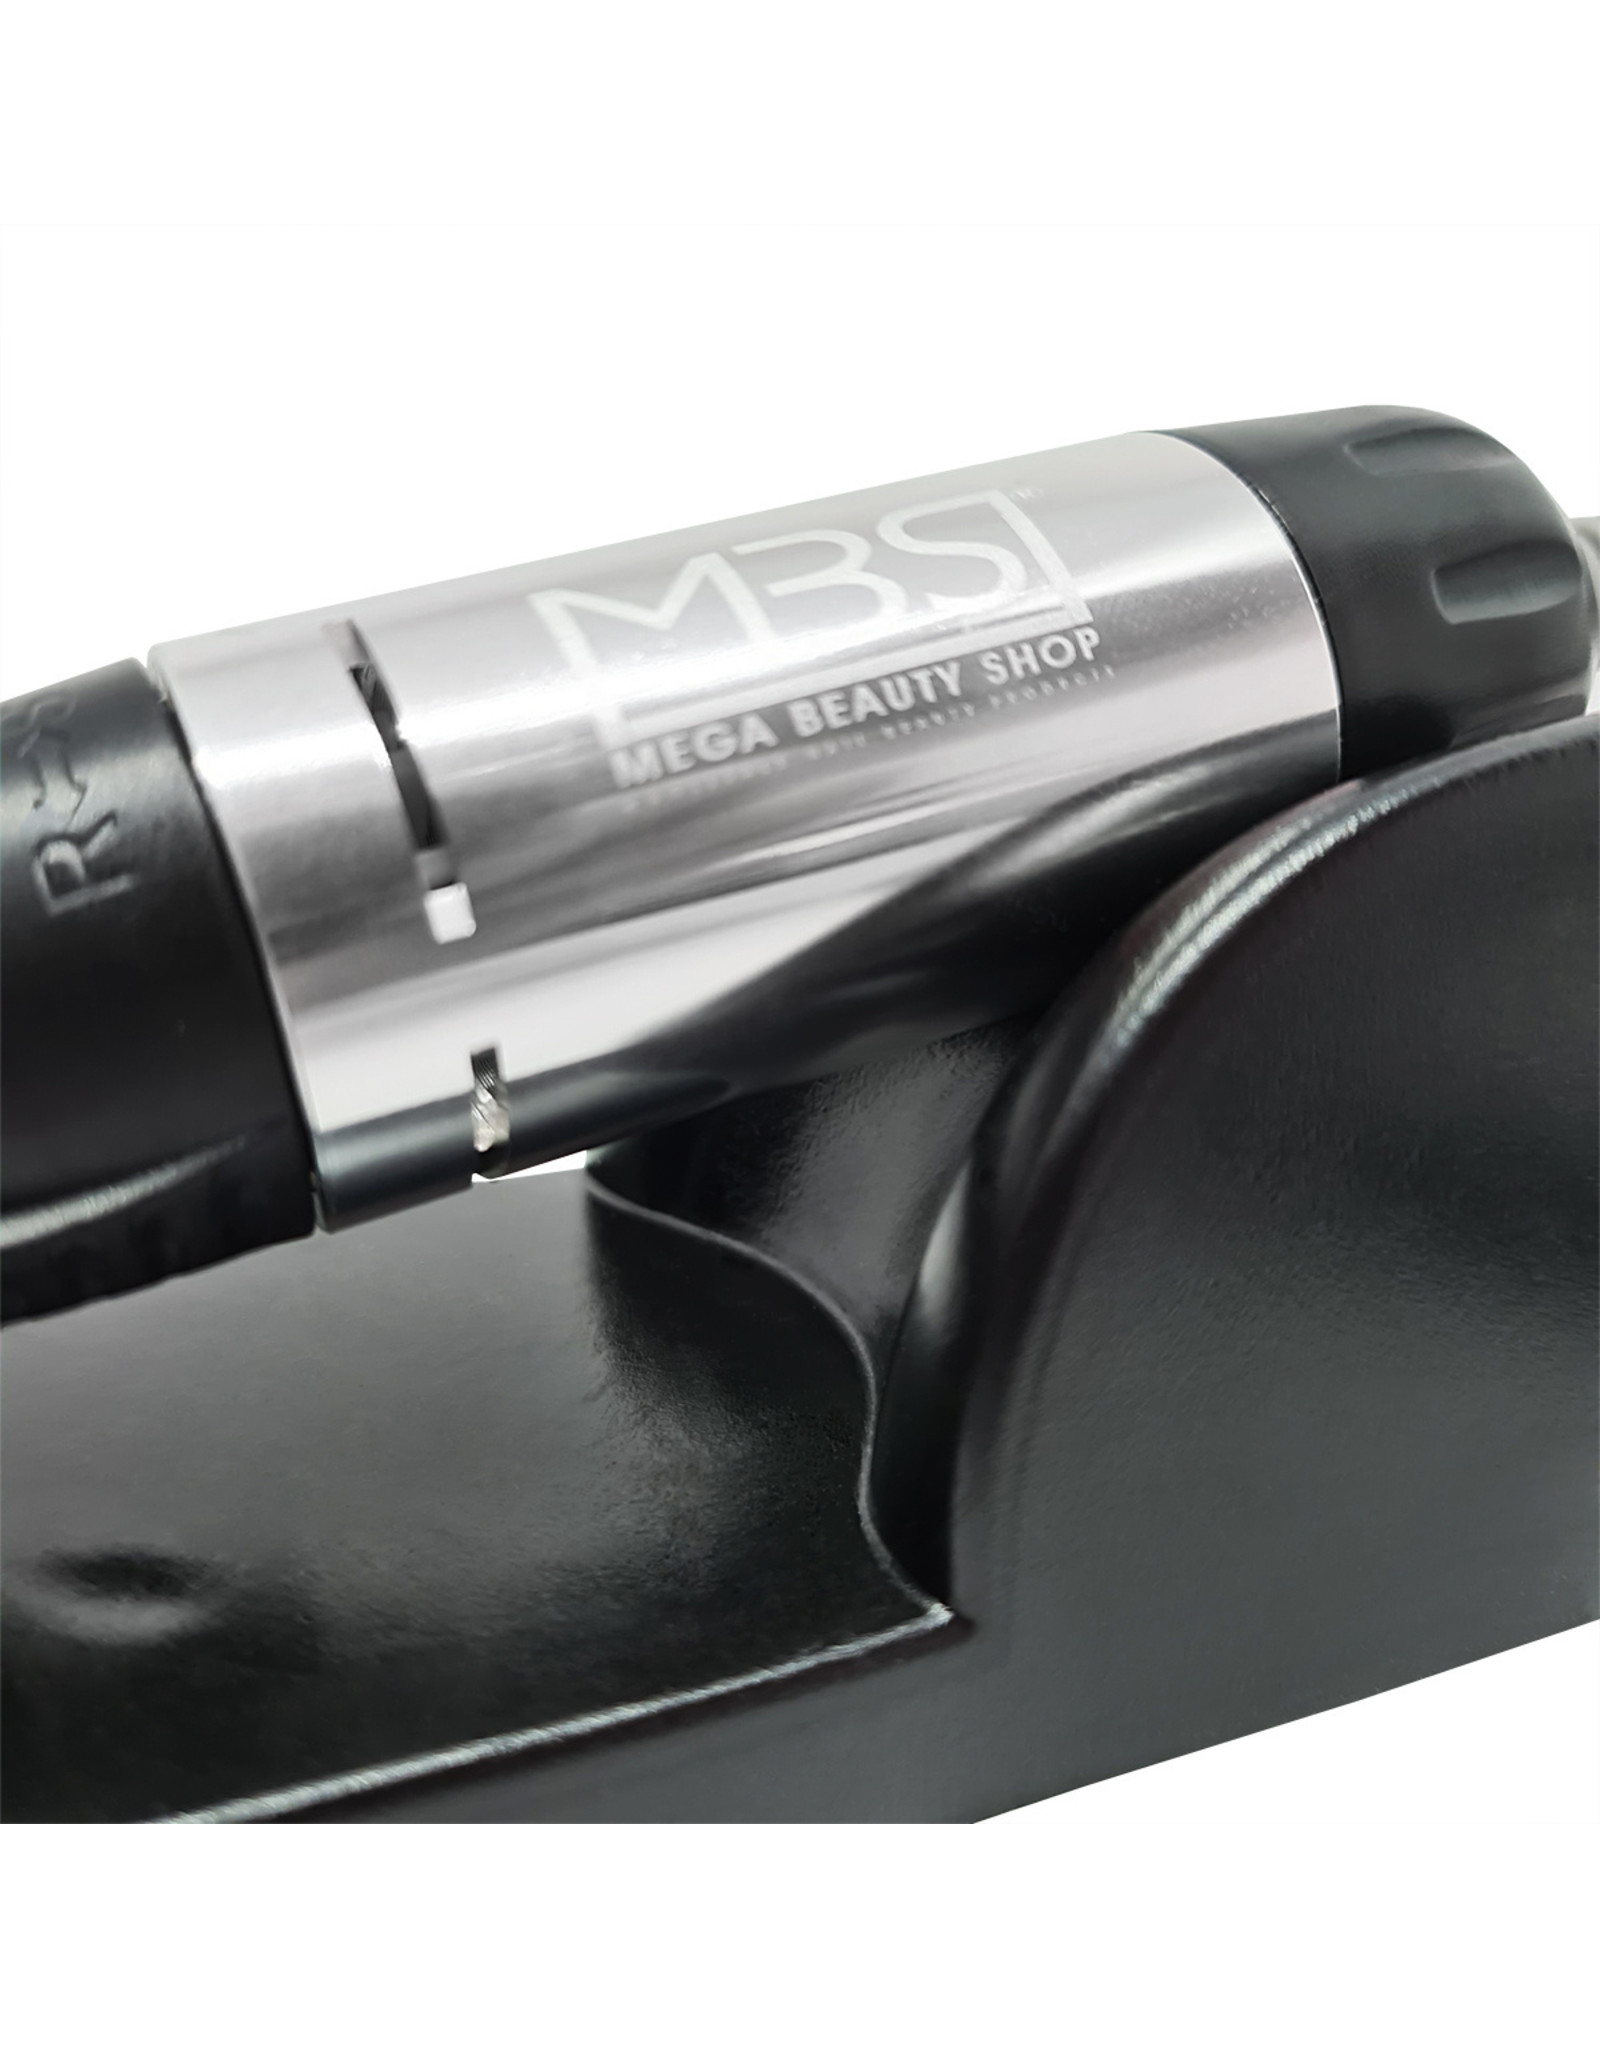 Mega Beauty Shop® Nagelfrees JD500 Zwart 35Watt Originele + Keramische frees MBS®